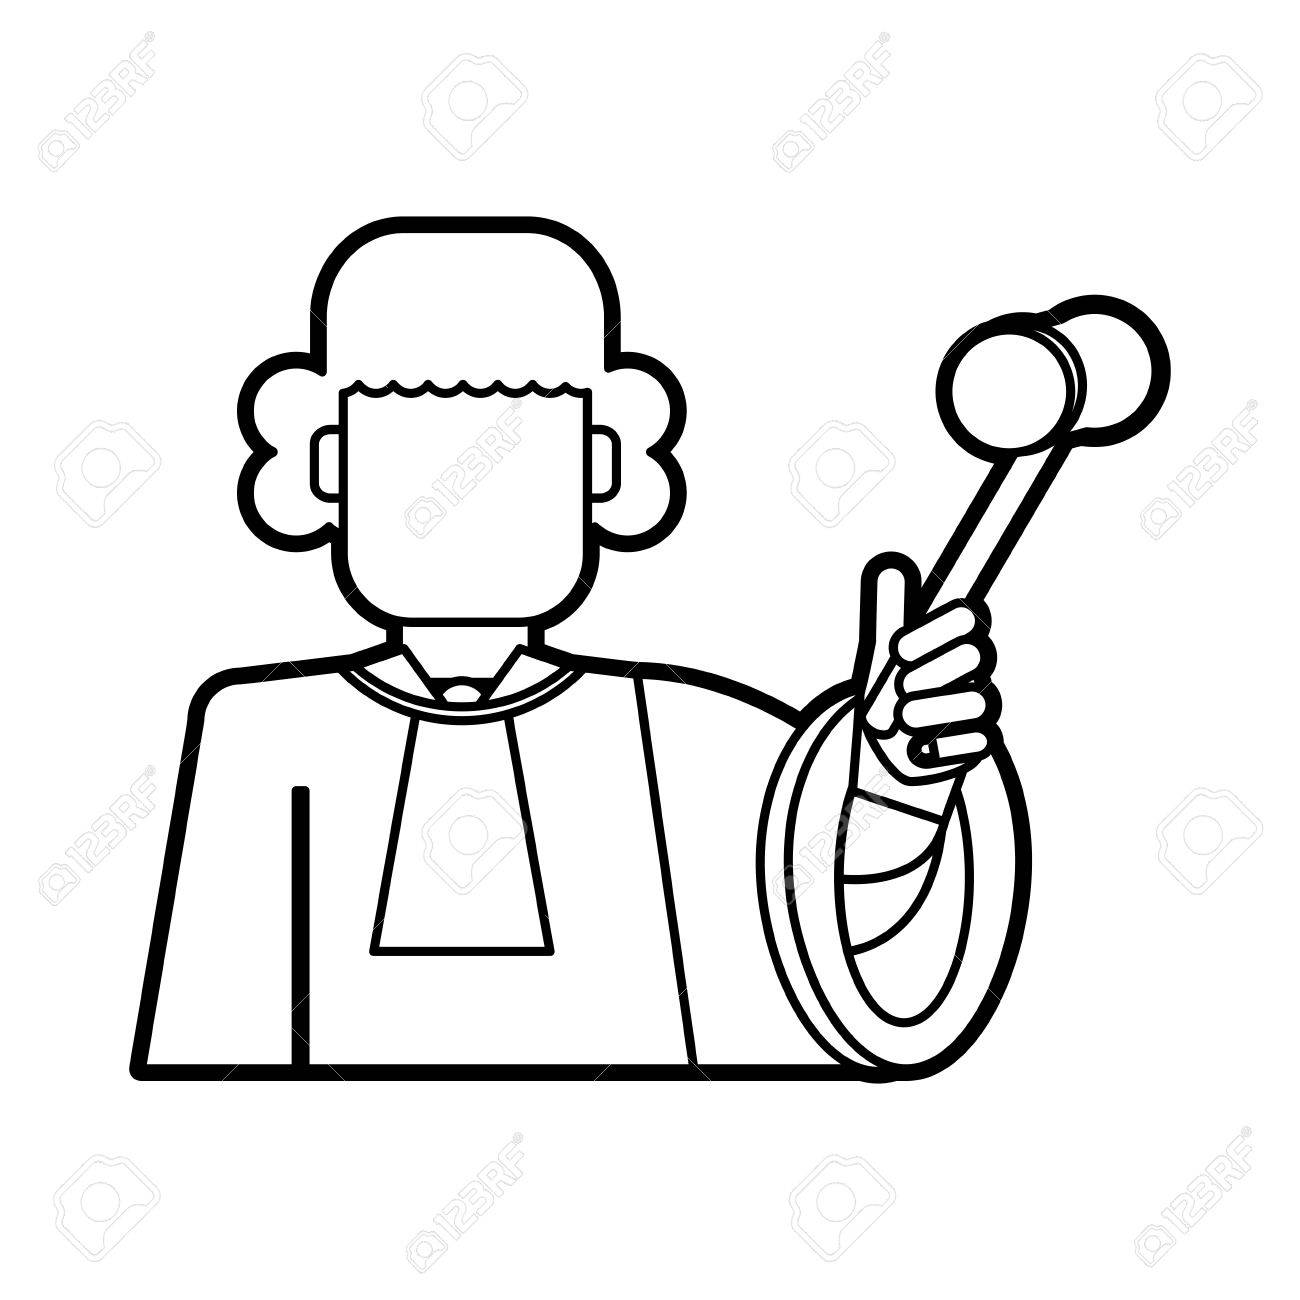 Judges Gavel Drawing At Getdrawings